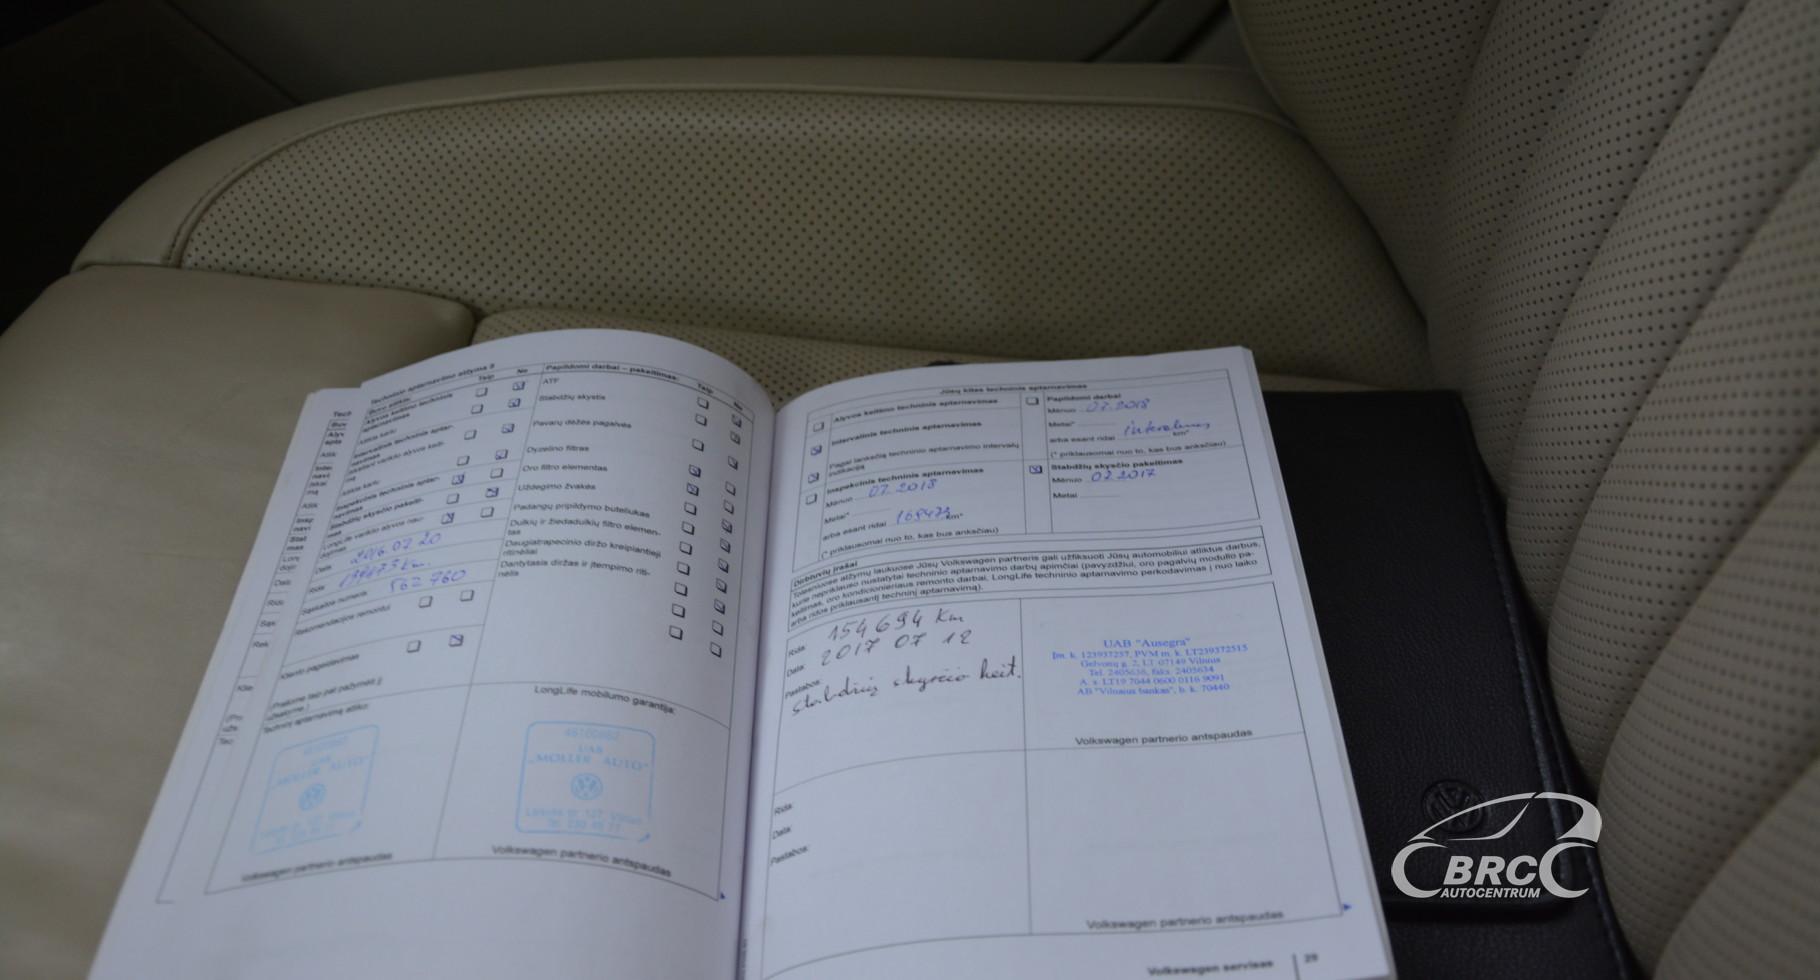 Volkswagen Phaeton 3.0 TDI V6 4Motion Automatas